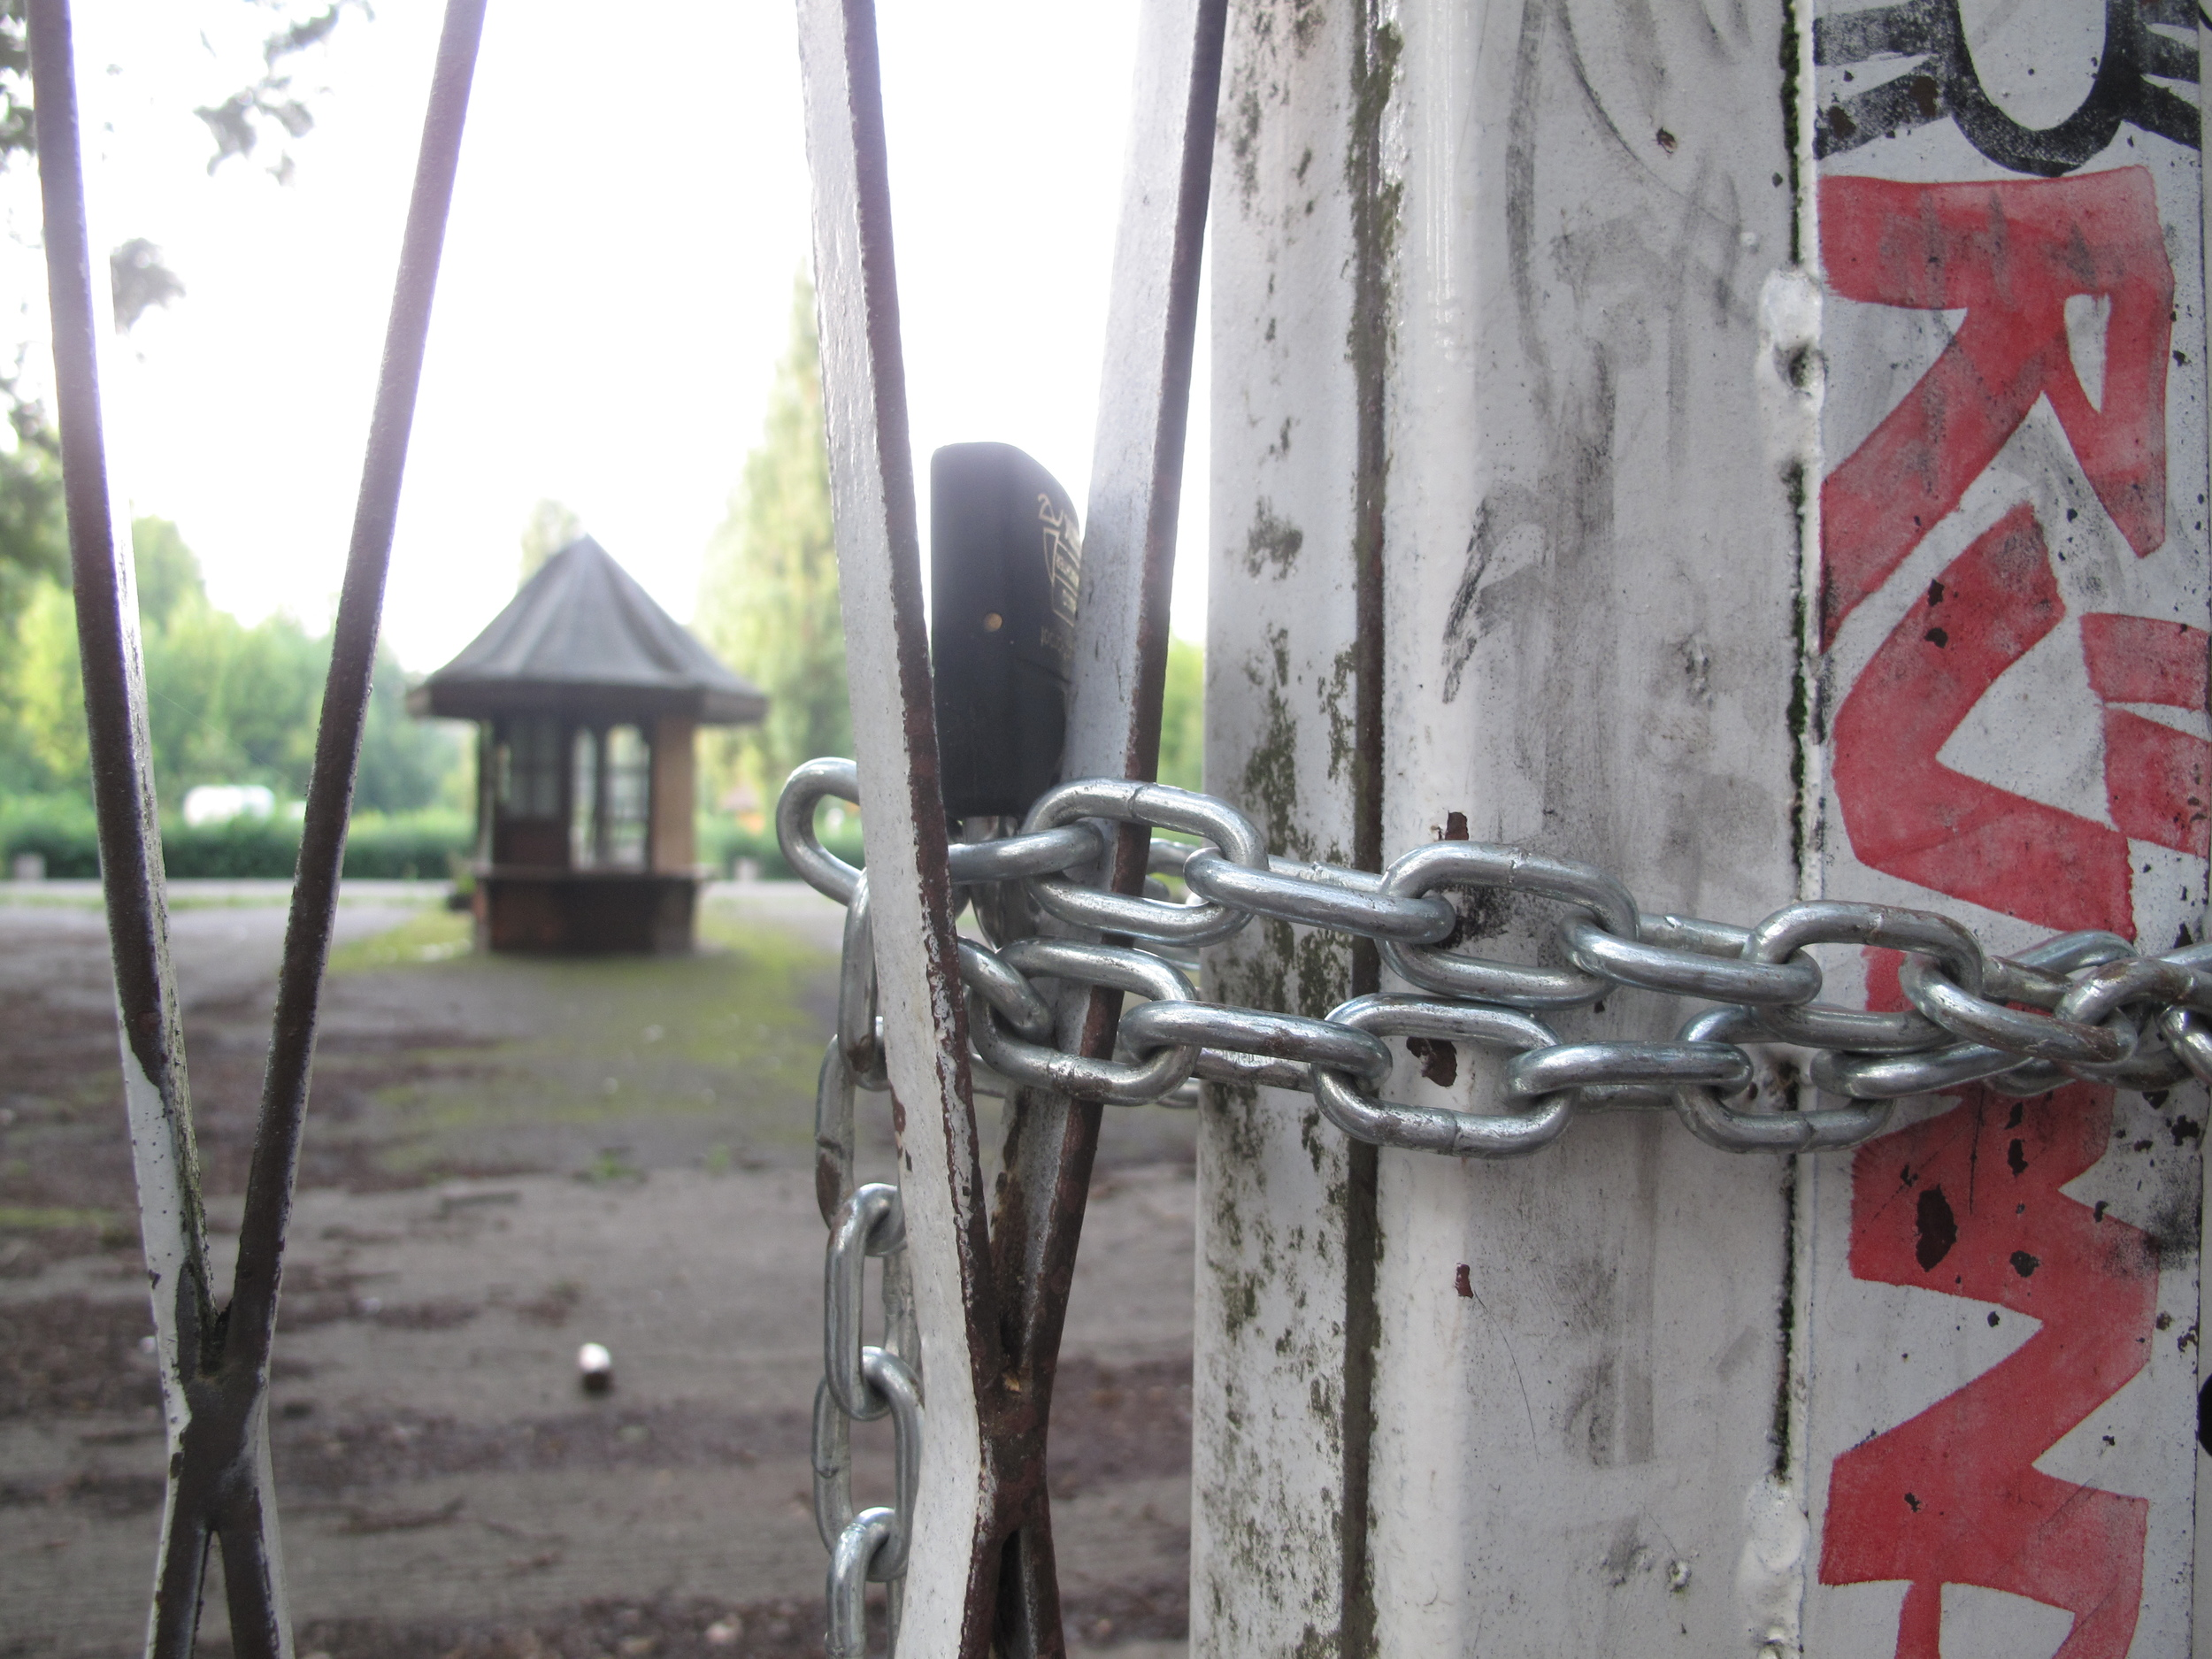 Gates to Spree Park the abandoned theme park - locked up.